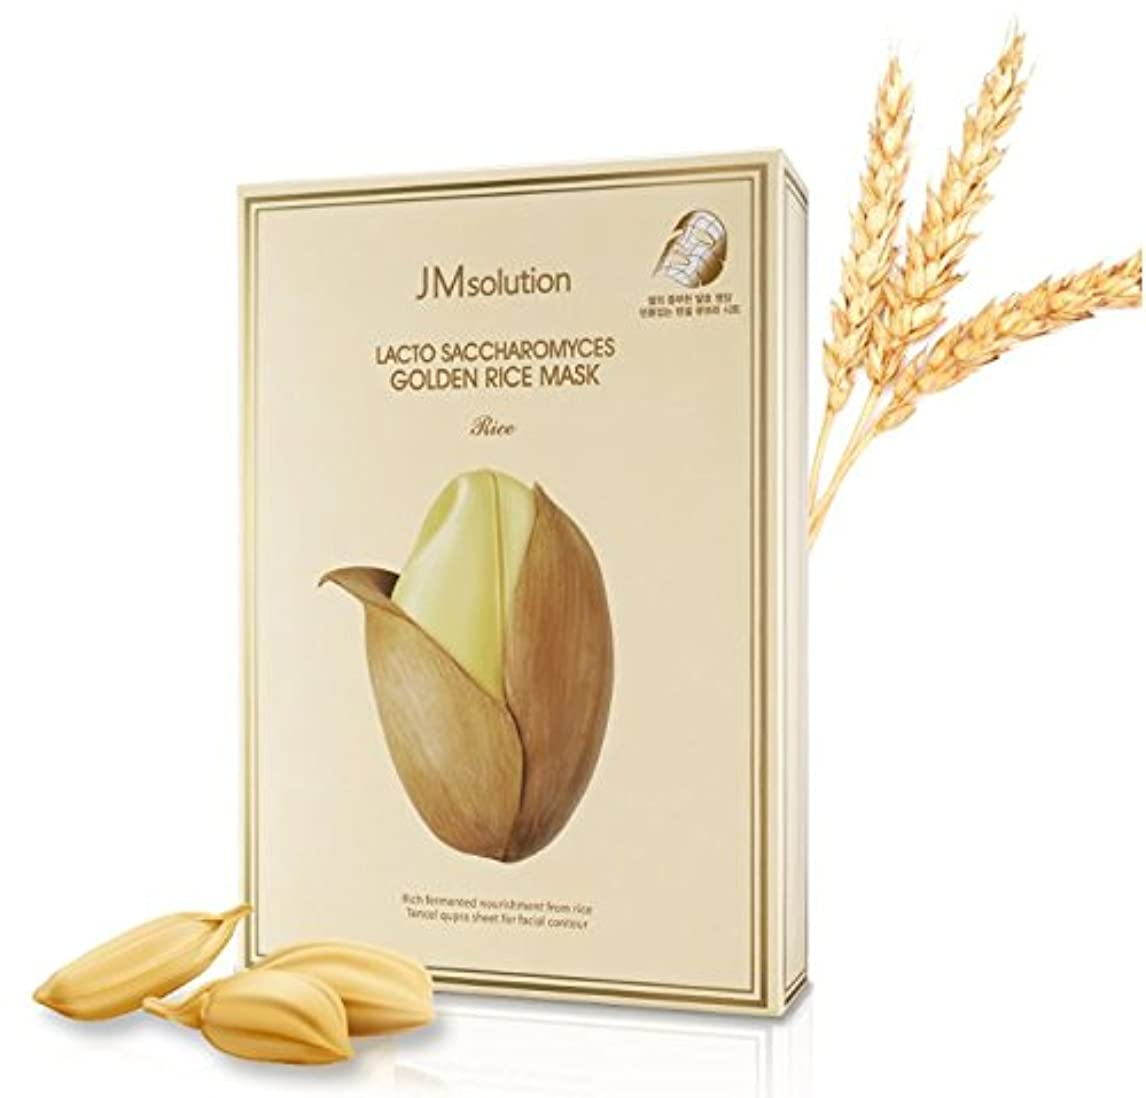 [JM solution] Lacto Saccharomyces Golden Rice Mask 30ml*10ea [並行輸入品]